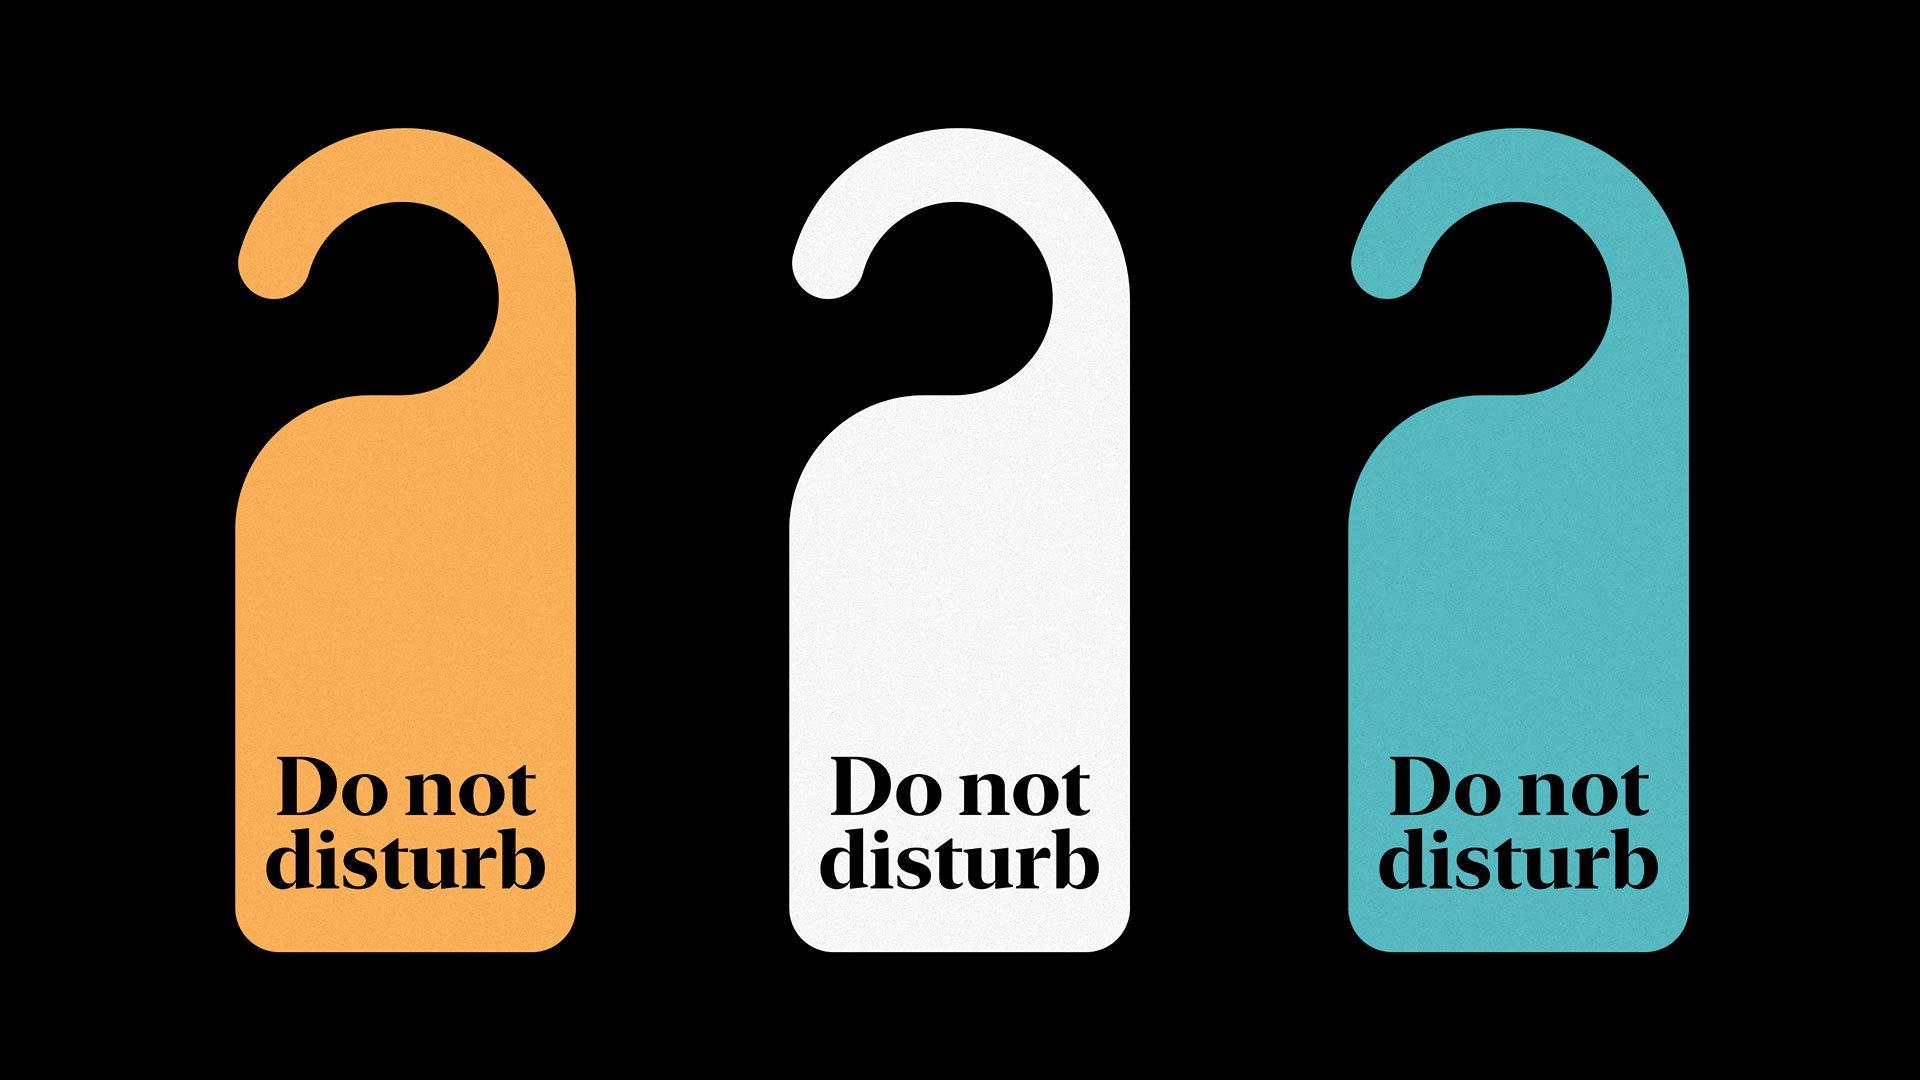 Use_Do_Not_Disturb_mode